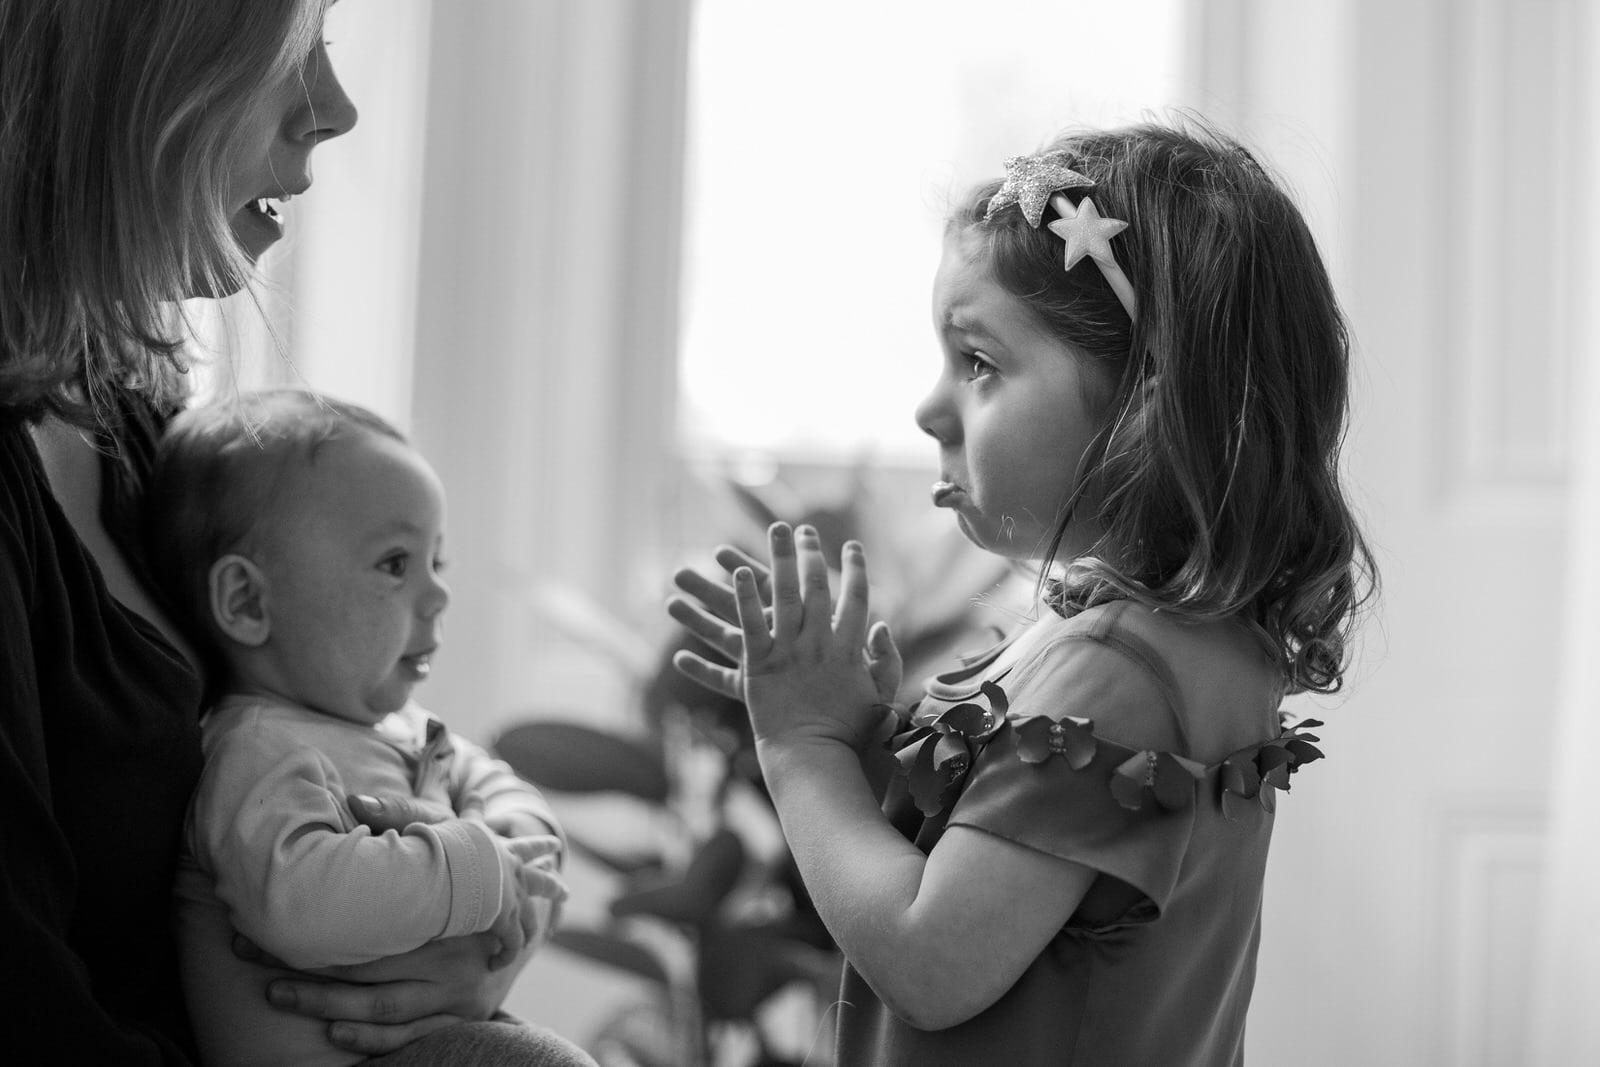 kensington-day-in-the-life-documentary-family-photographs-0122